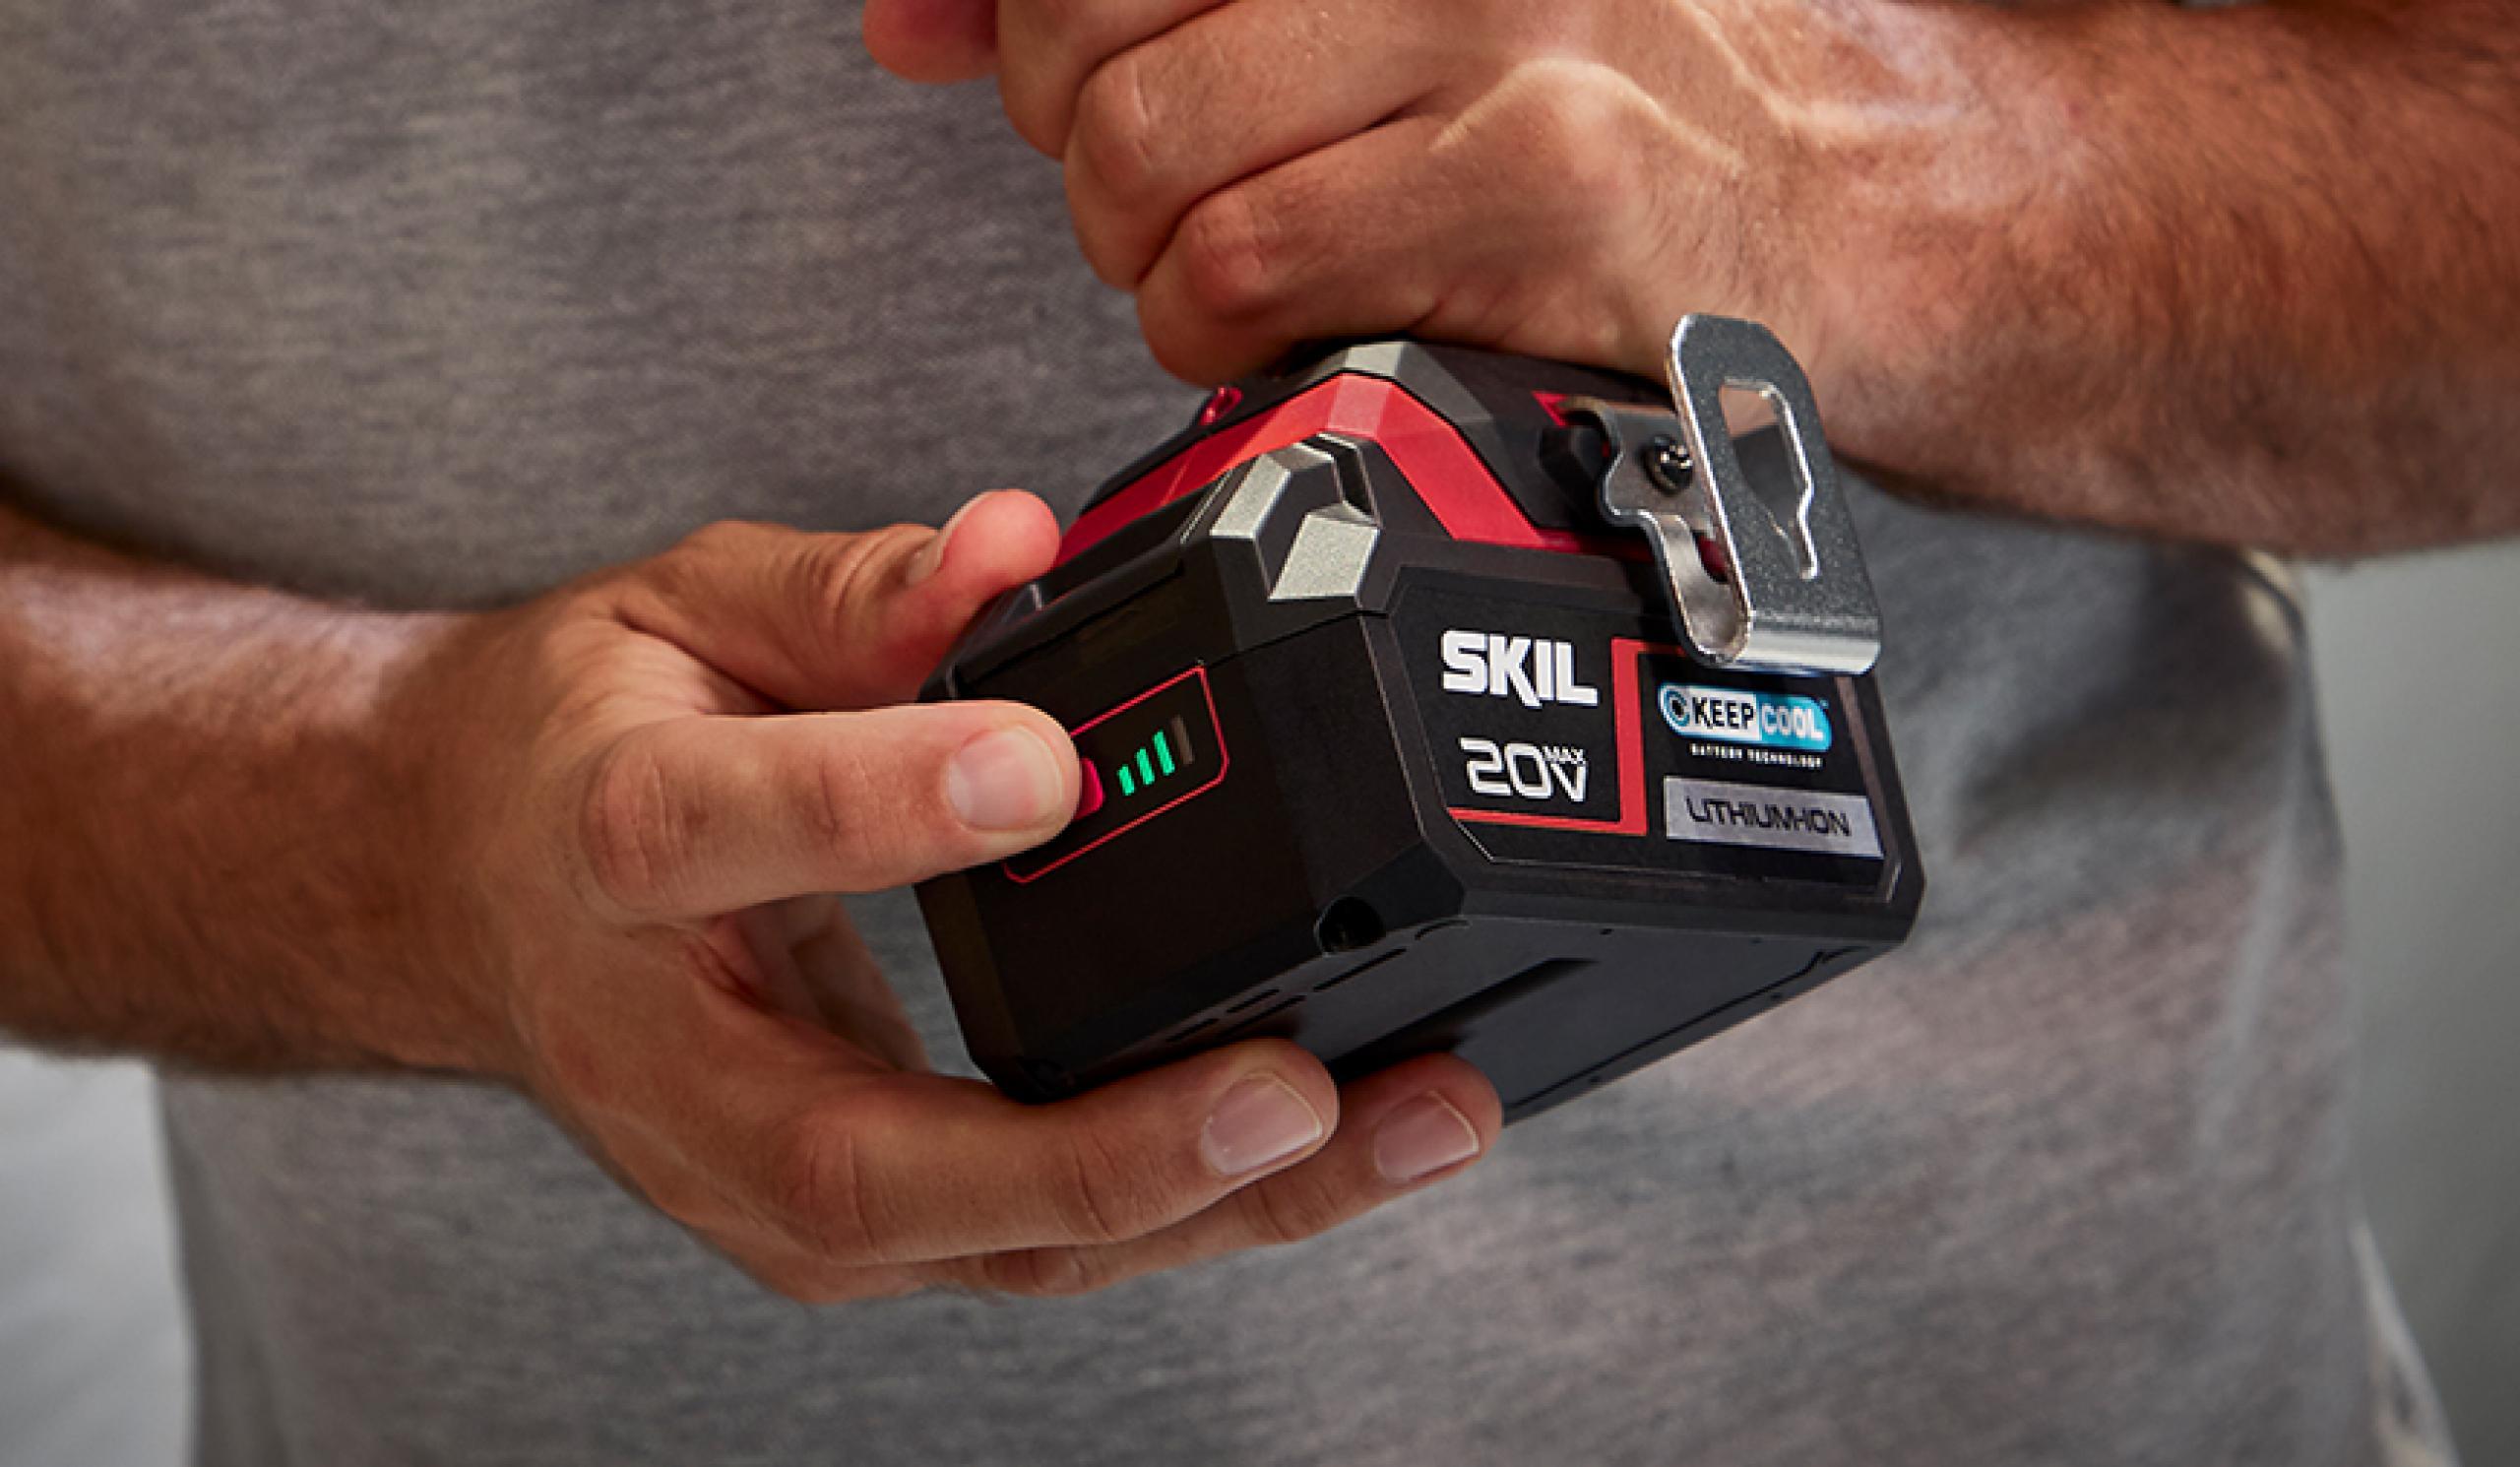 Patentirani indikator ravni napolnjenosti akumulatorja: indikator, ki mu lahko zaupate